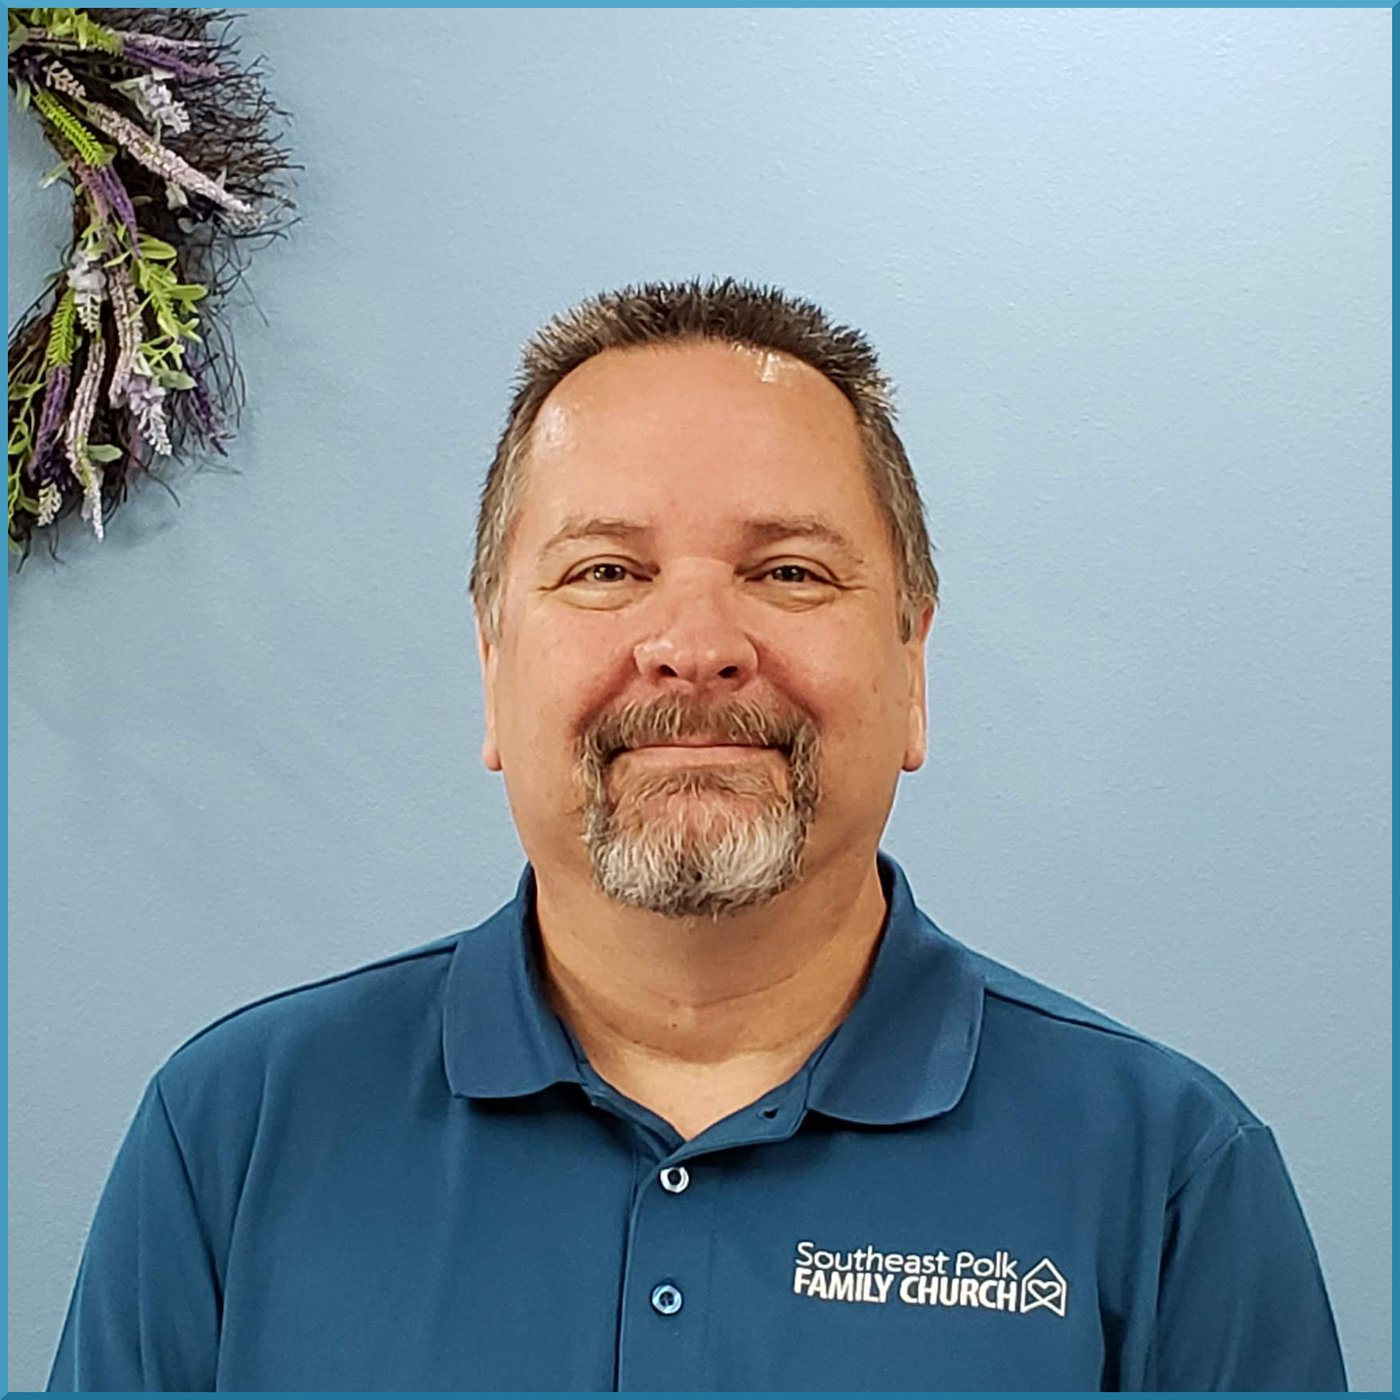 David Harper - Director of Eastview Community Center